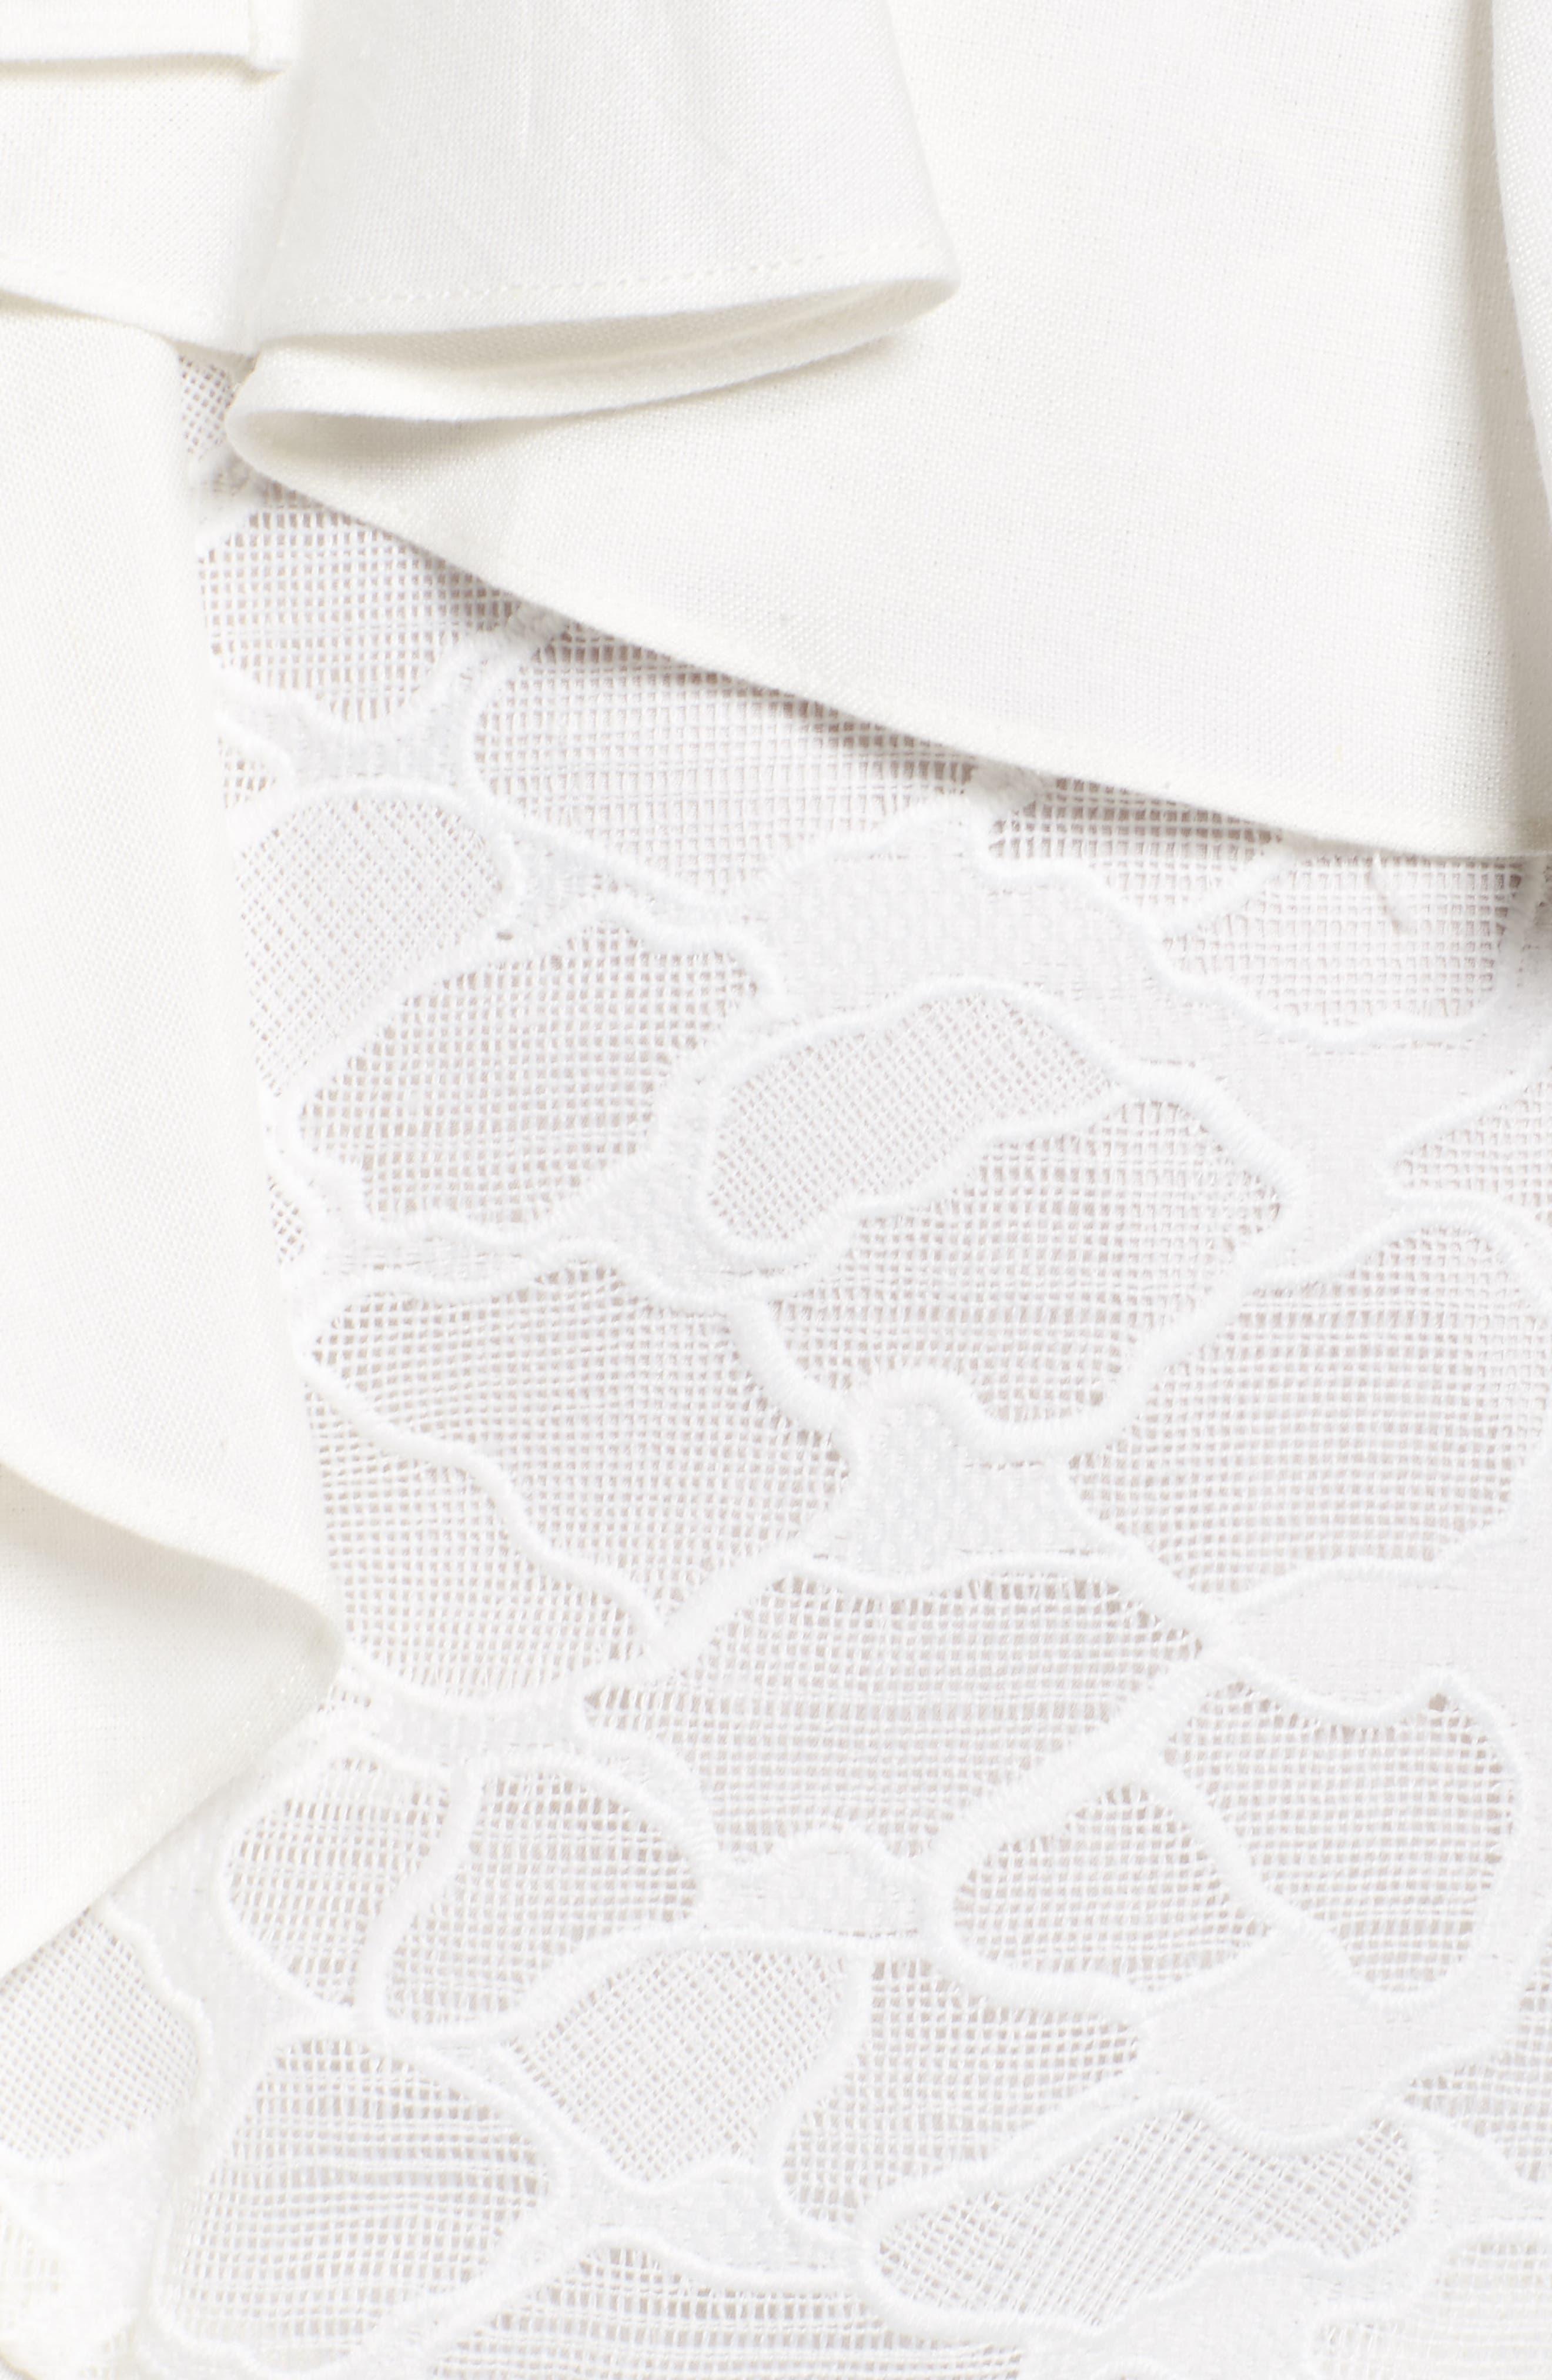 Phase Ruffle Lace Minidress,                             Alternate thumbnail 5, color,